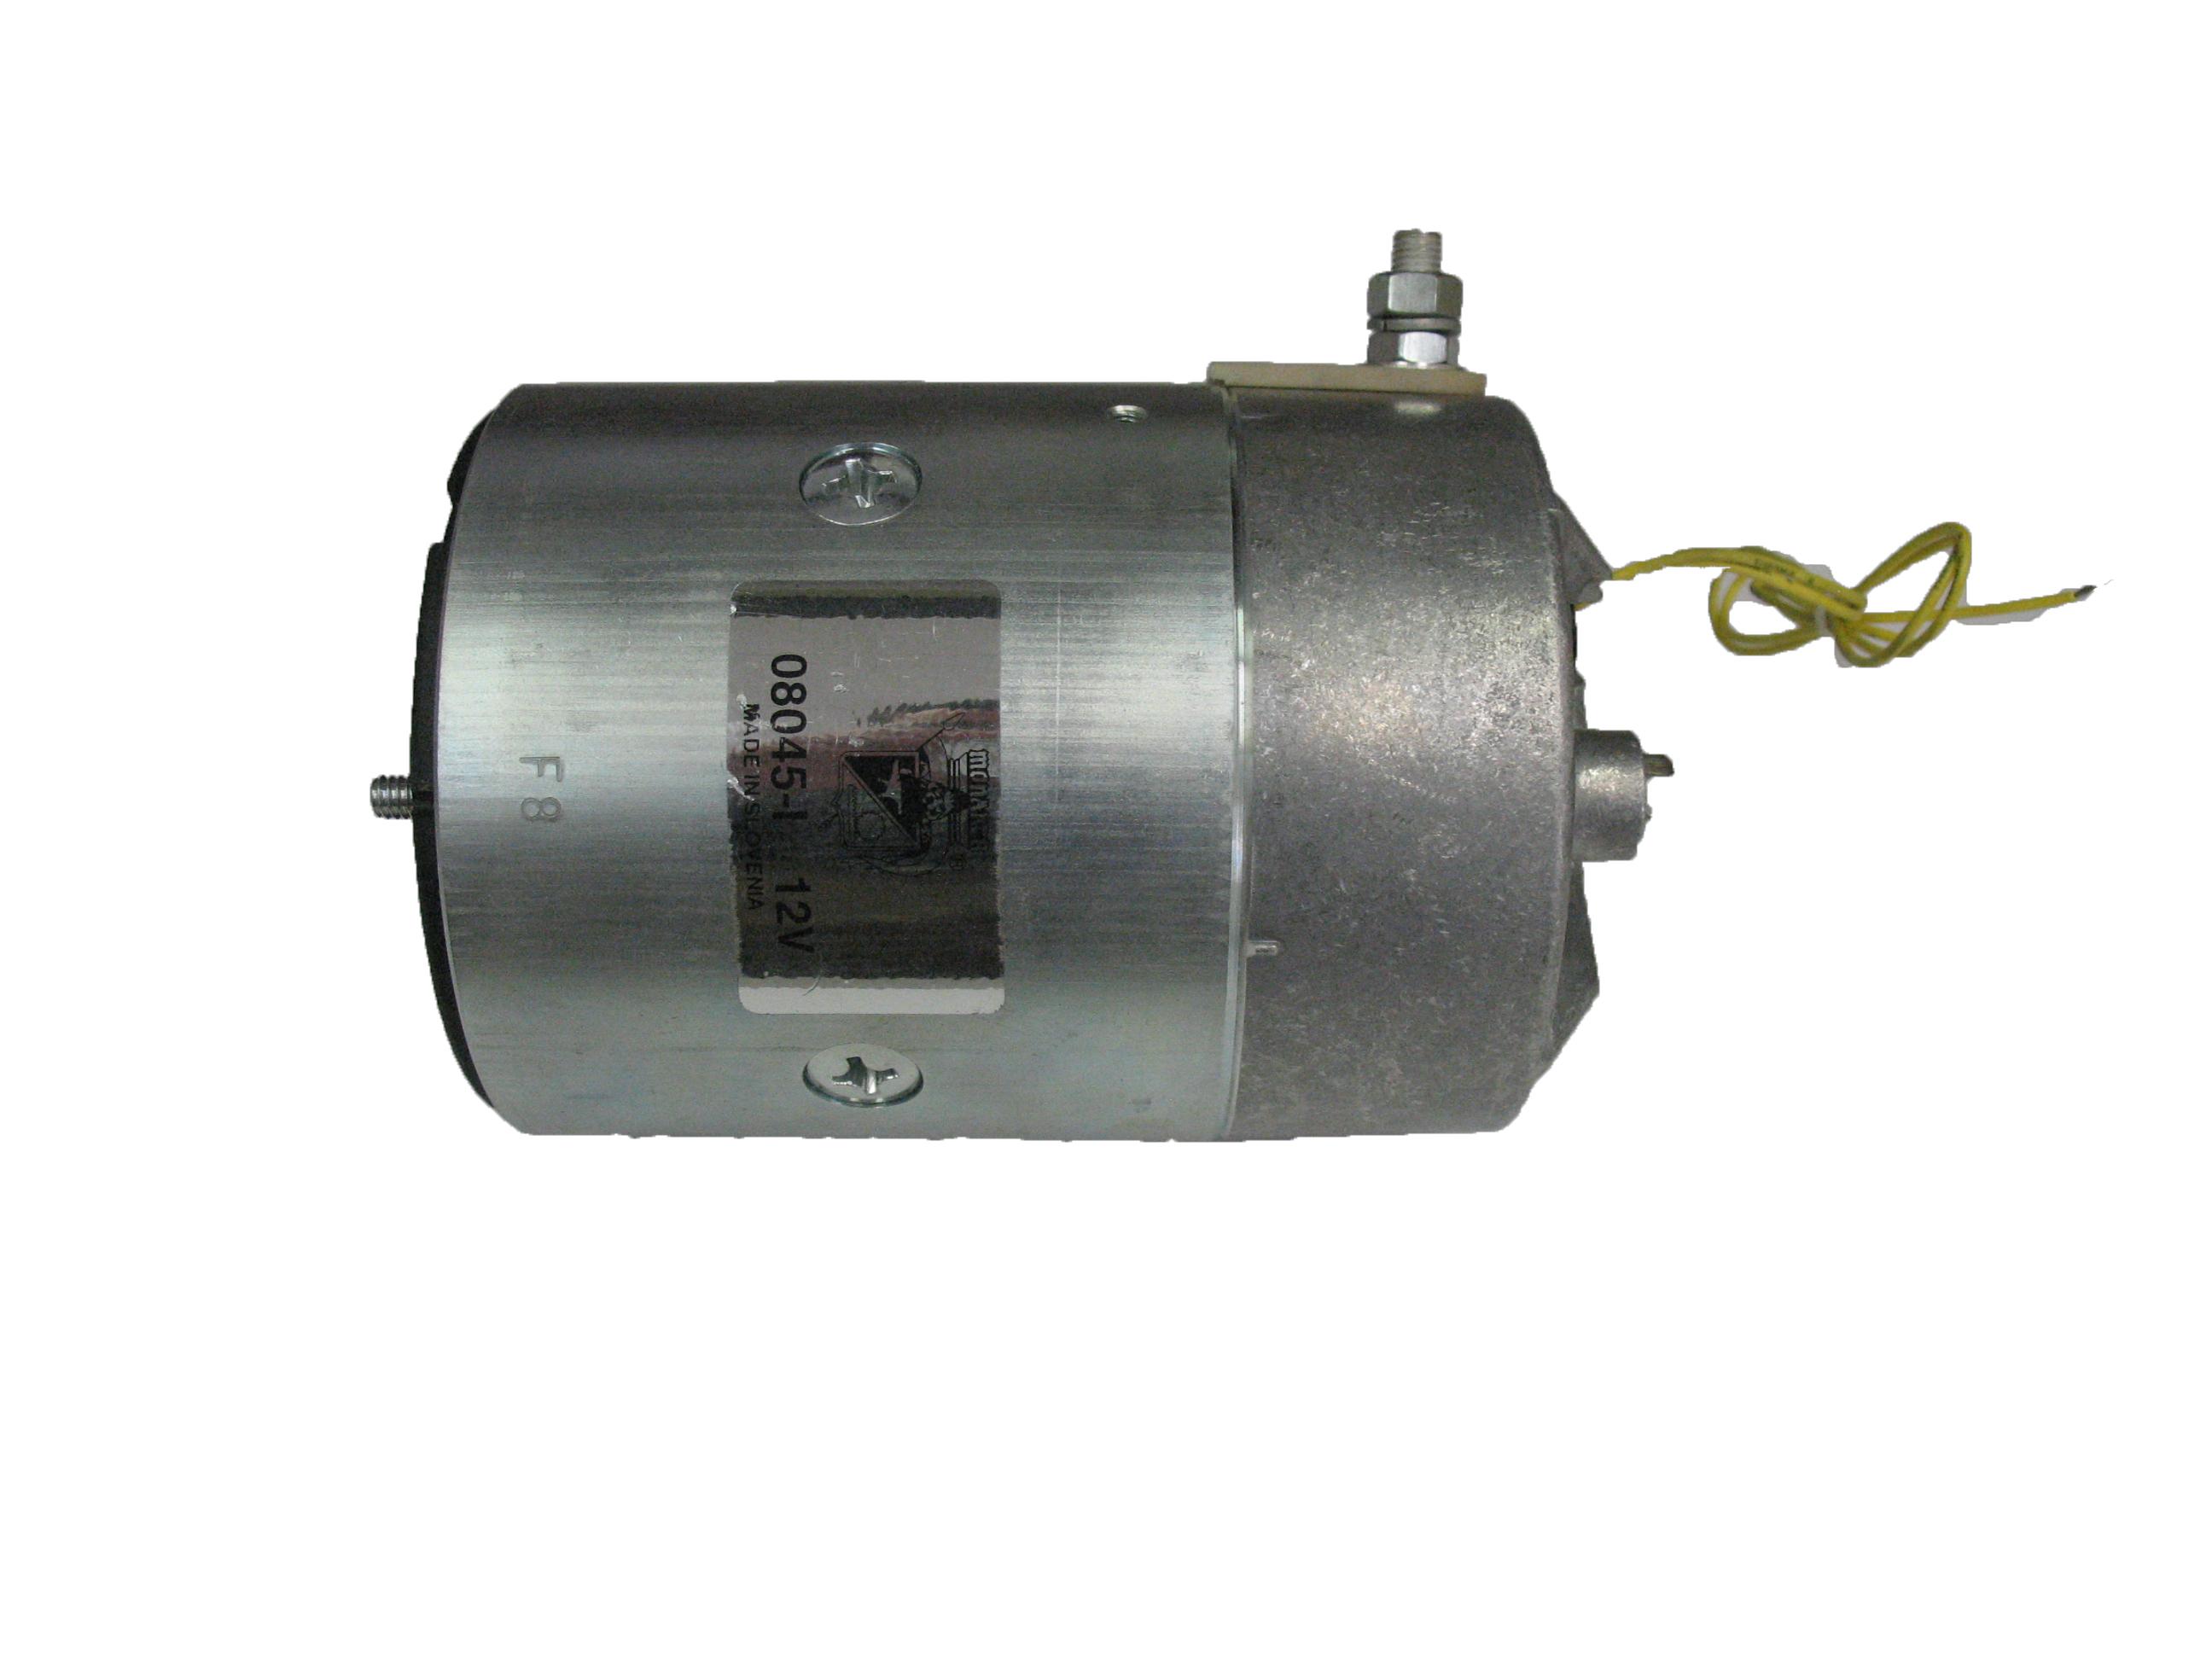 Waltco Hydraulic Pump Wiring Diagram List Of Schematic Circuit Rh Hydraulicpumptsumasui Blogspot Com Liftgate Parts And Diagrams Leyman Iteparts